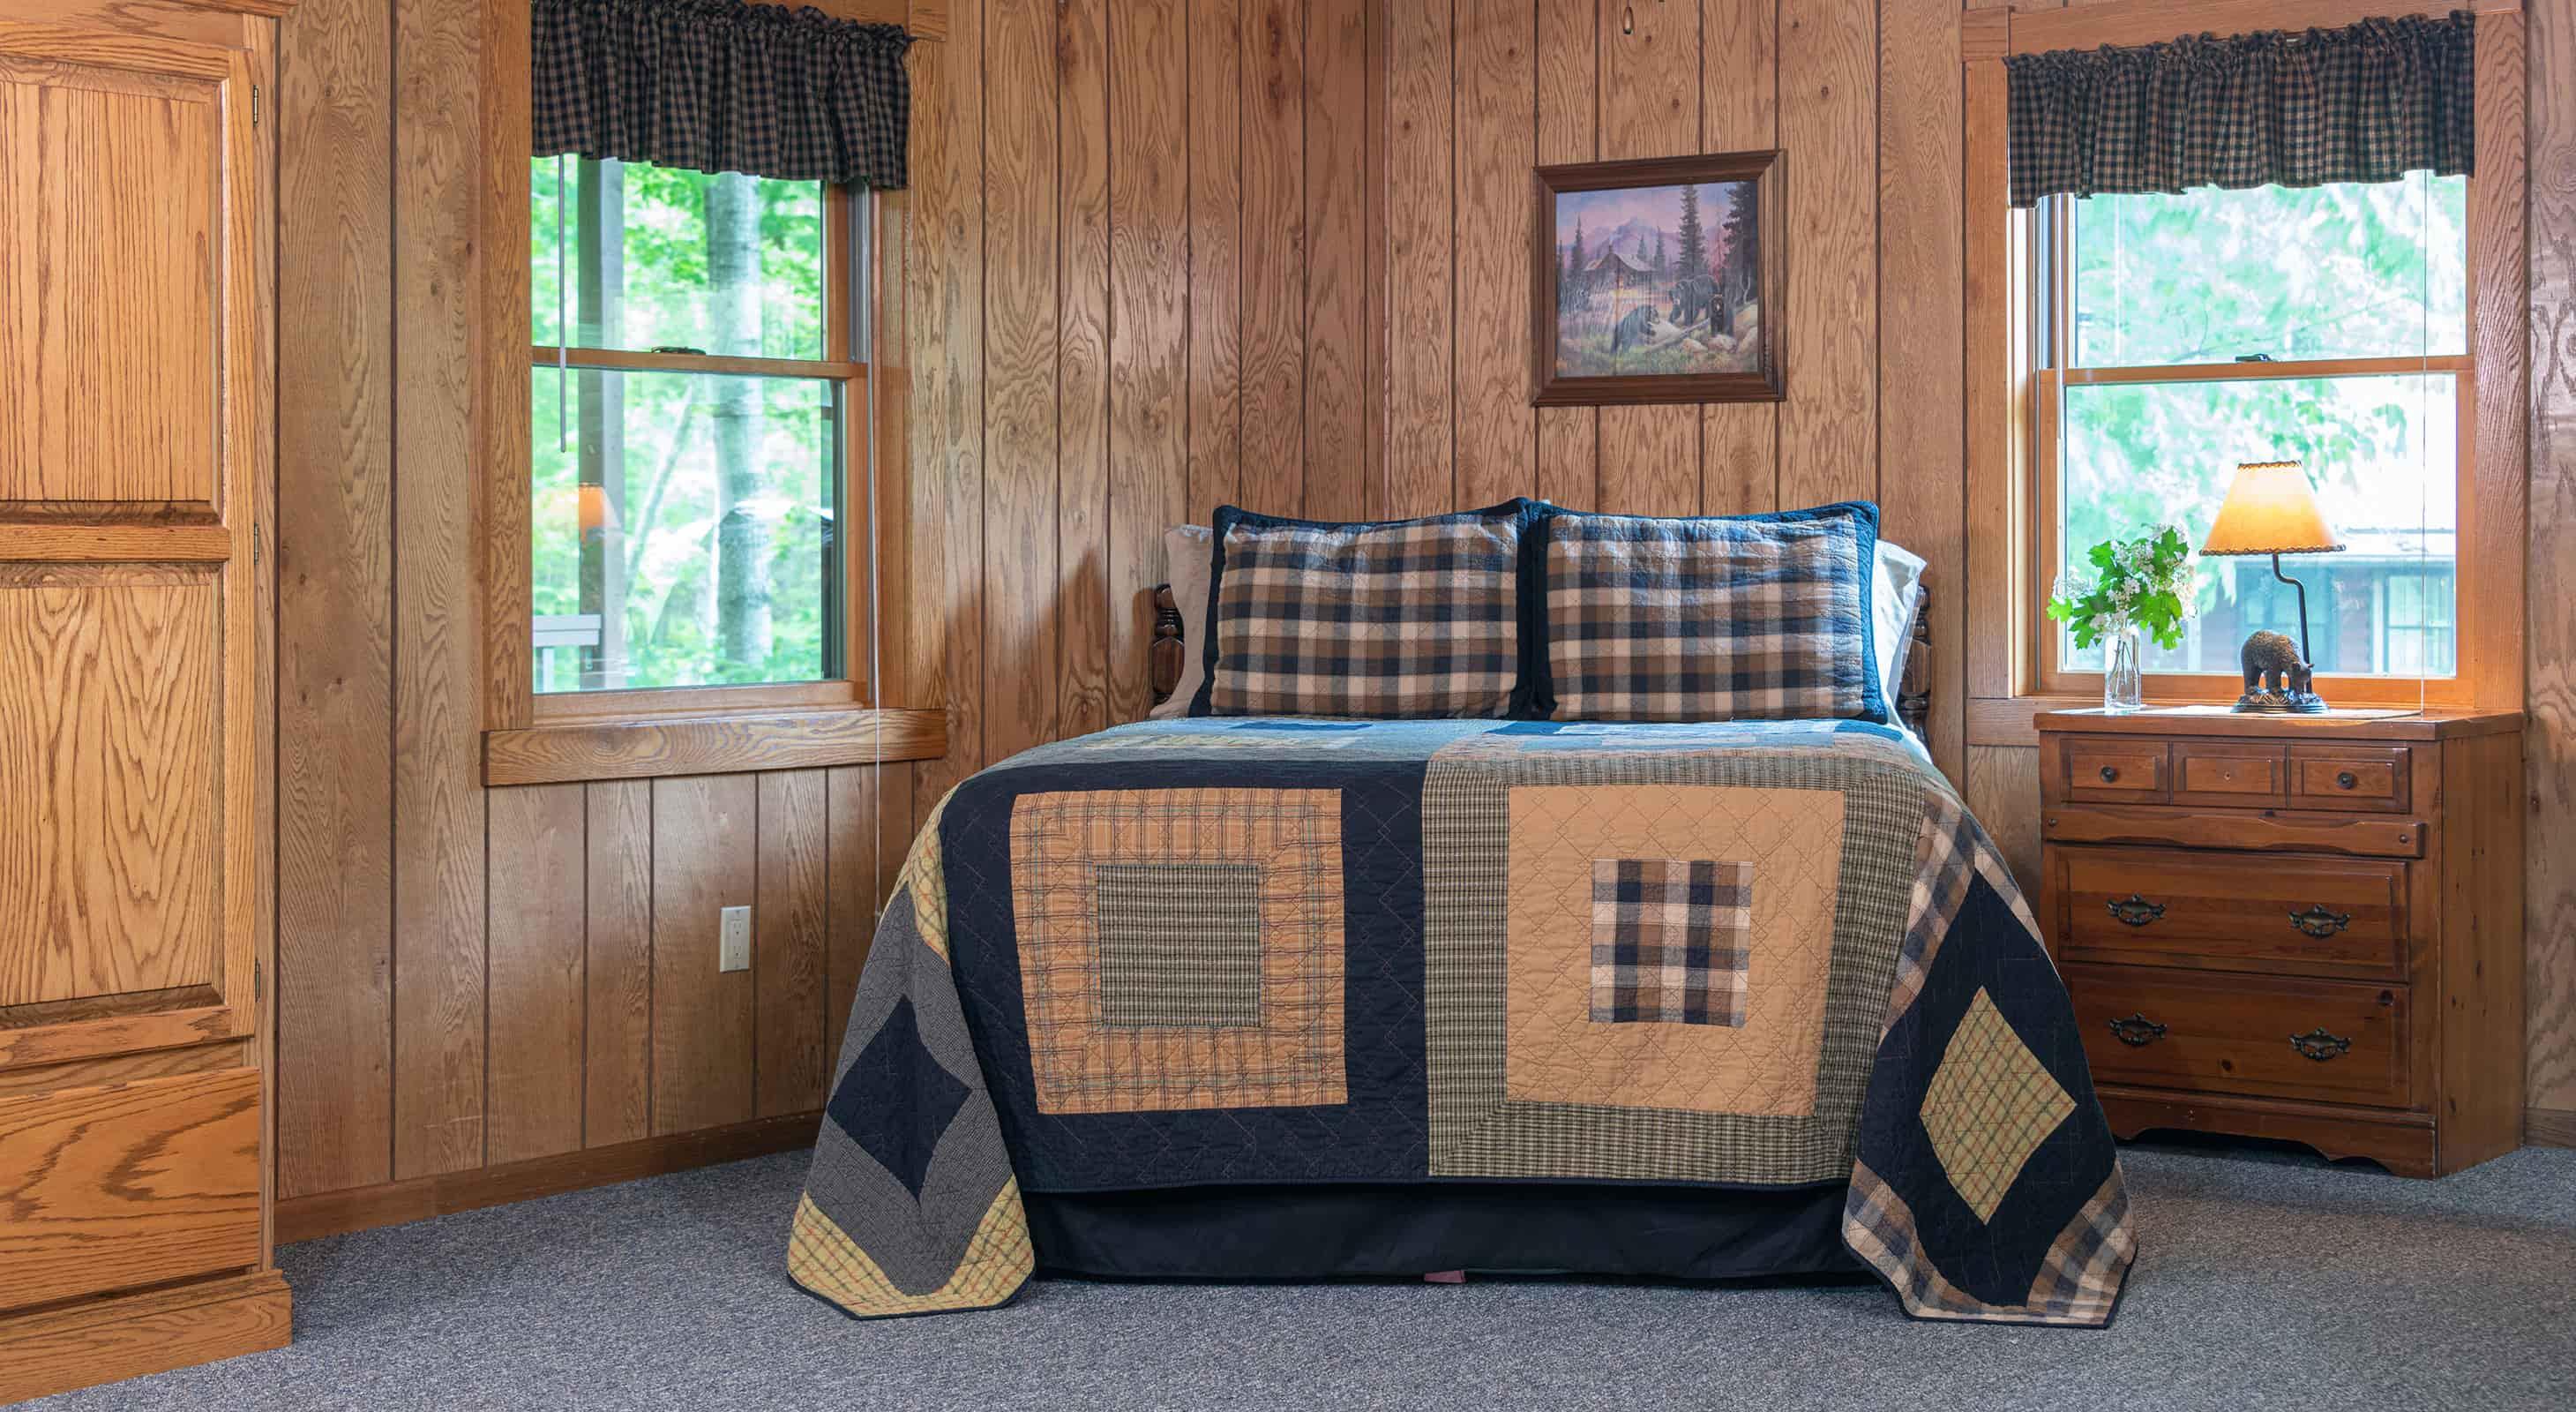 Wilderness Cabin - Starved Rock lodging in Illinois